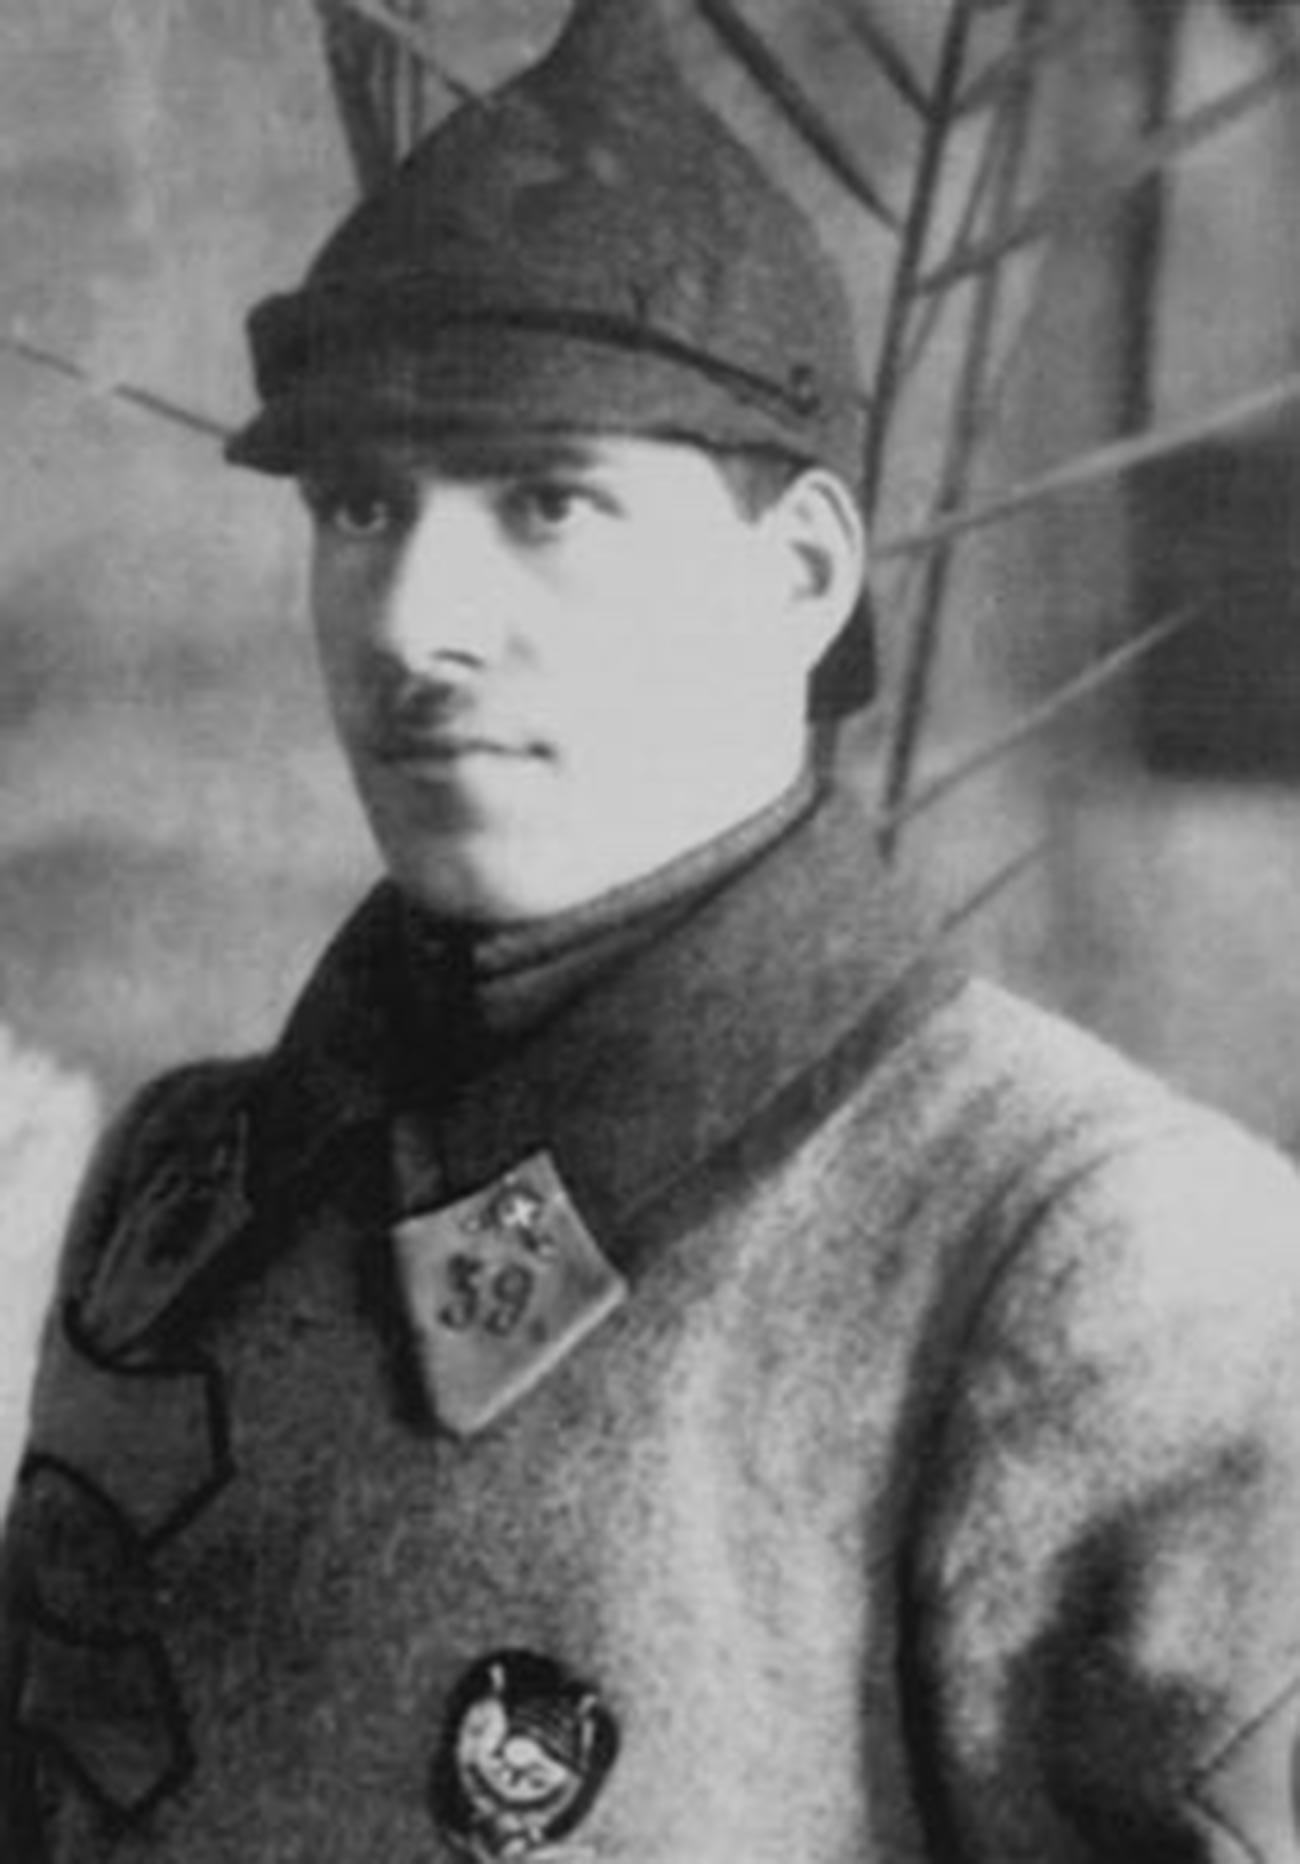 Georgy Zhukov in 1923.